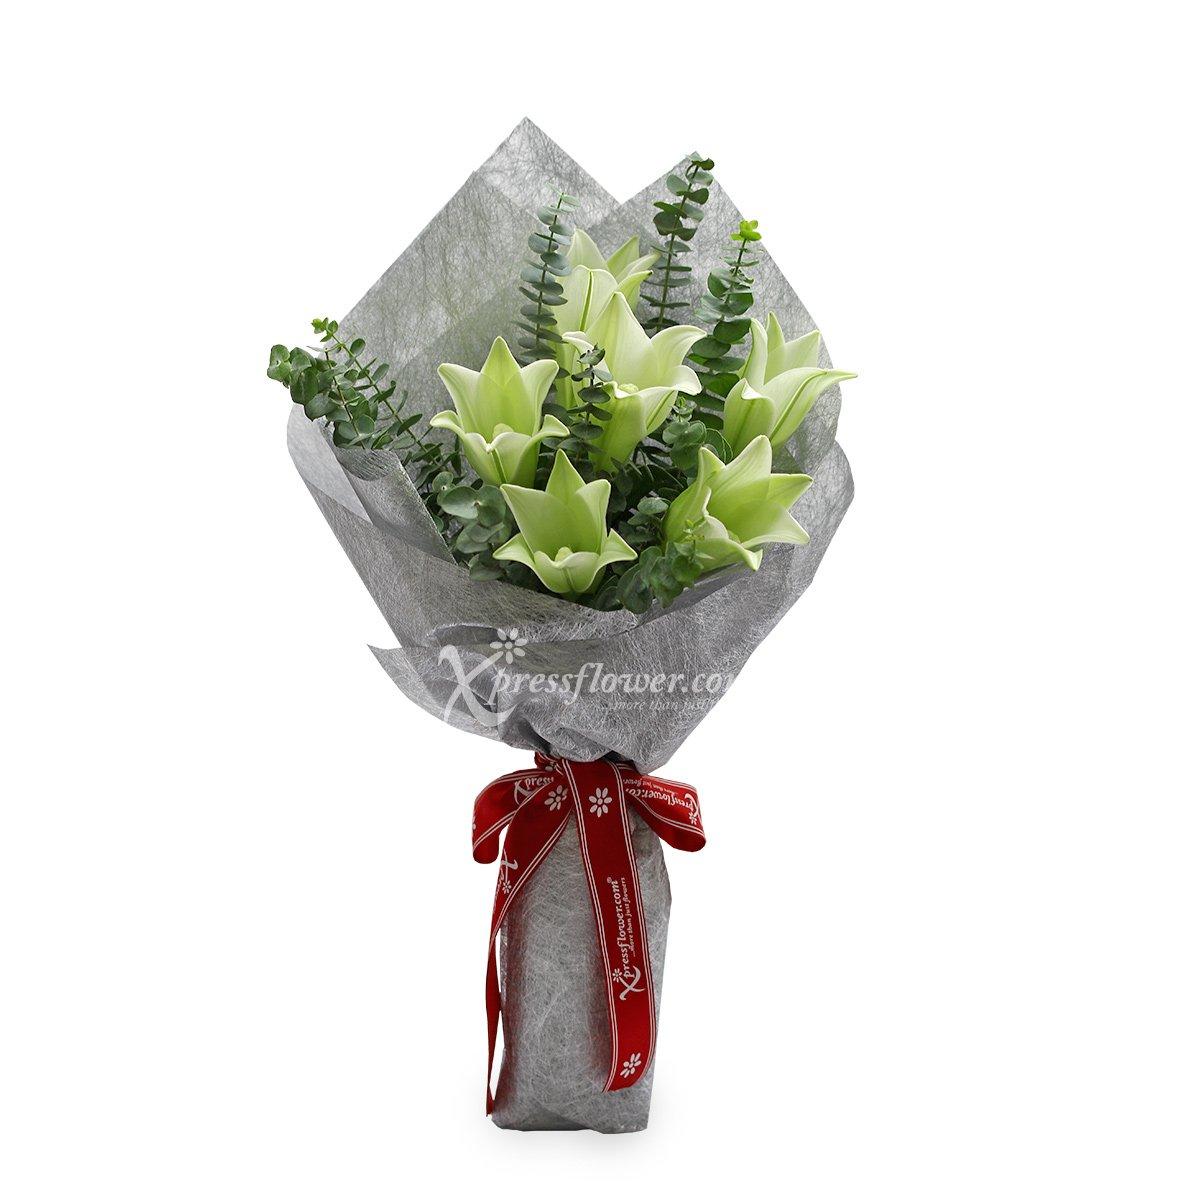 Aphrodisiac (6 stalk Lilies)